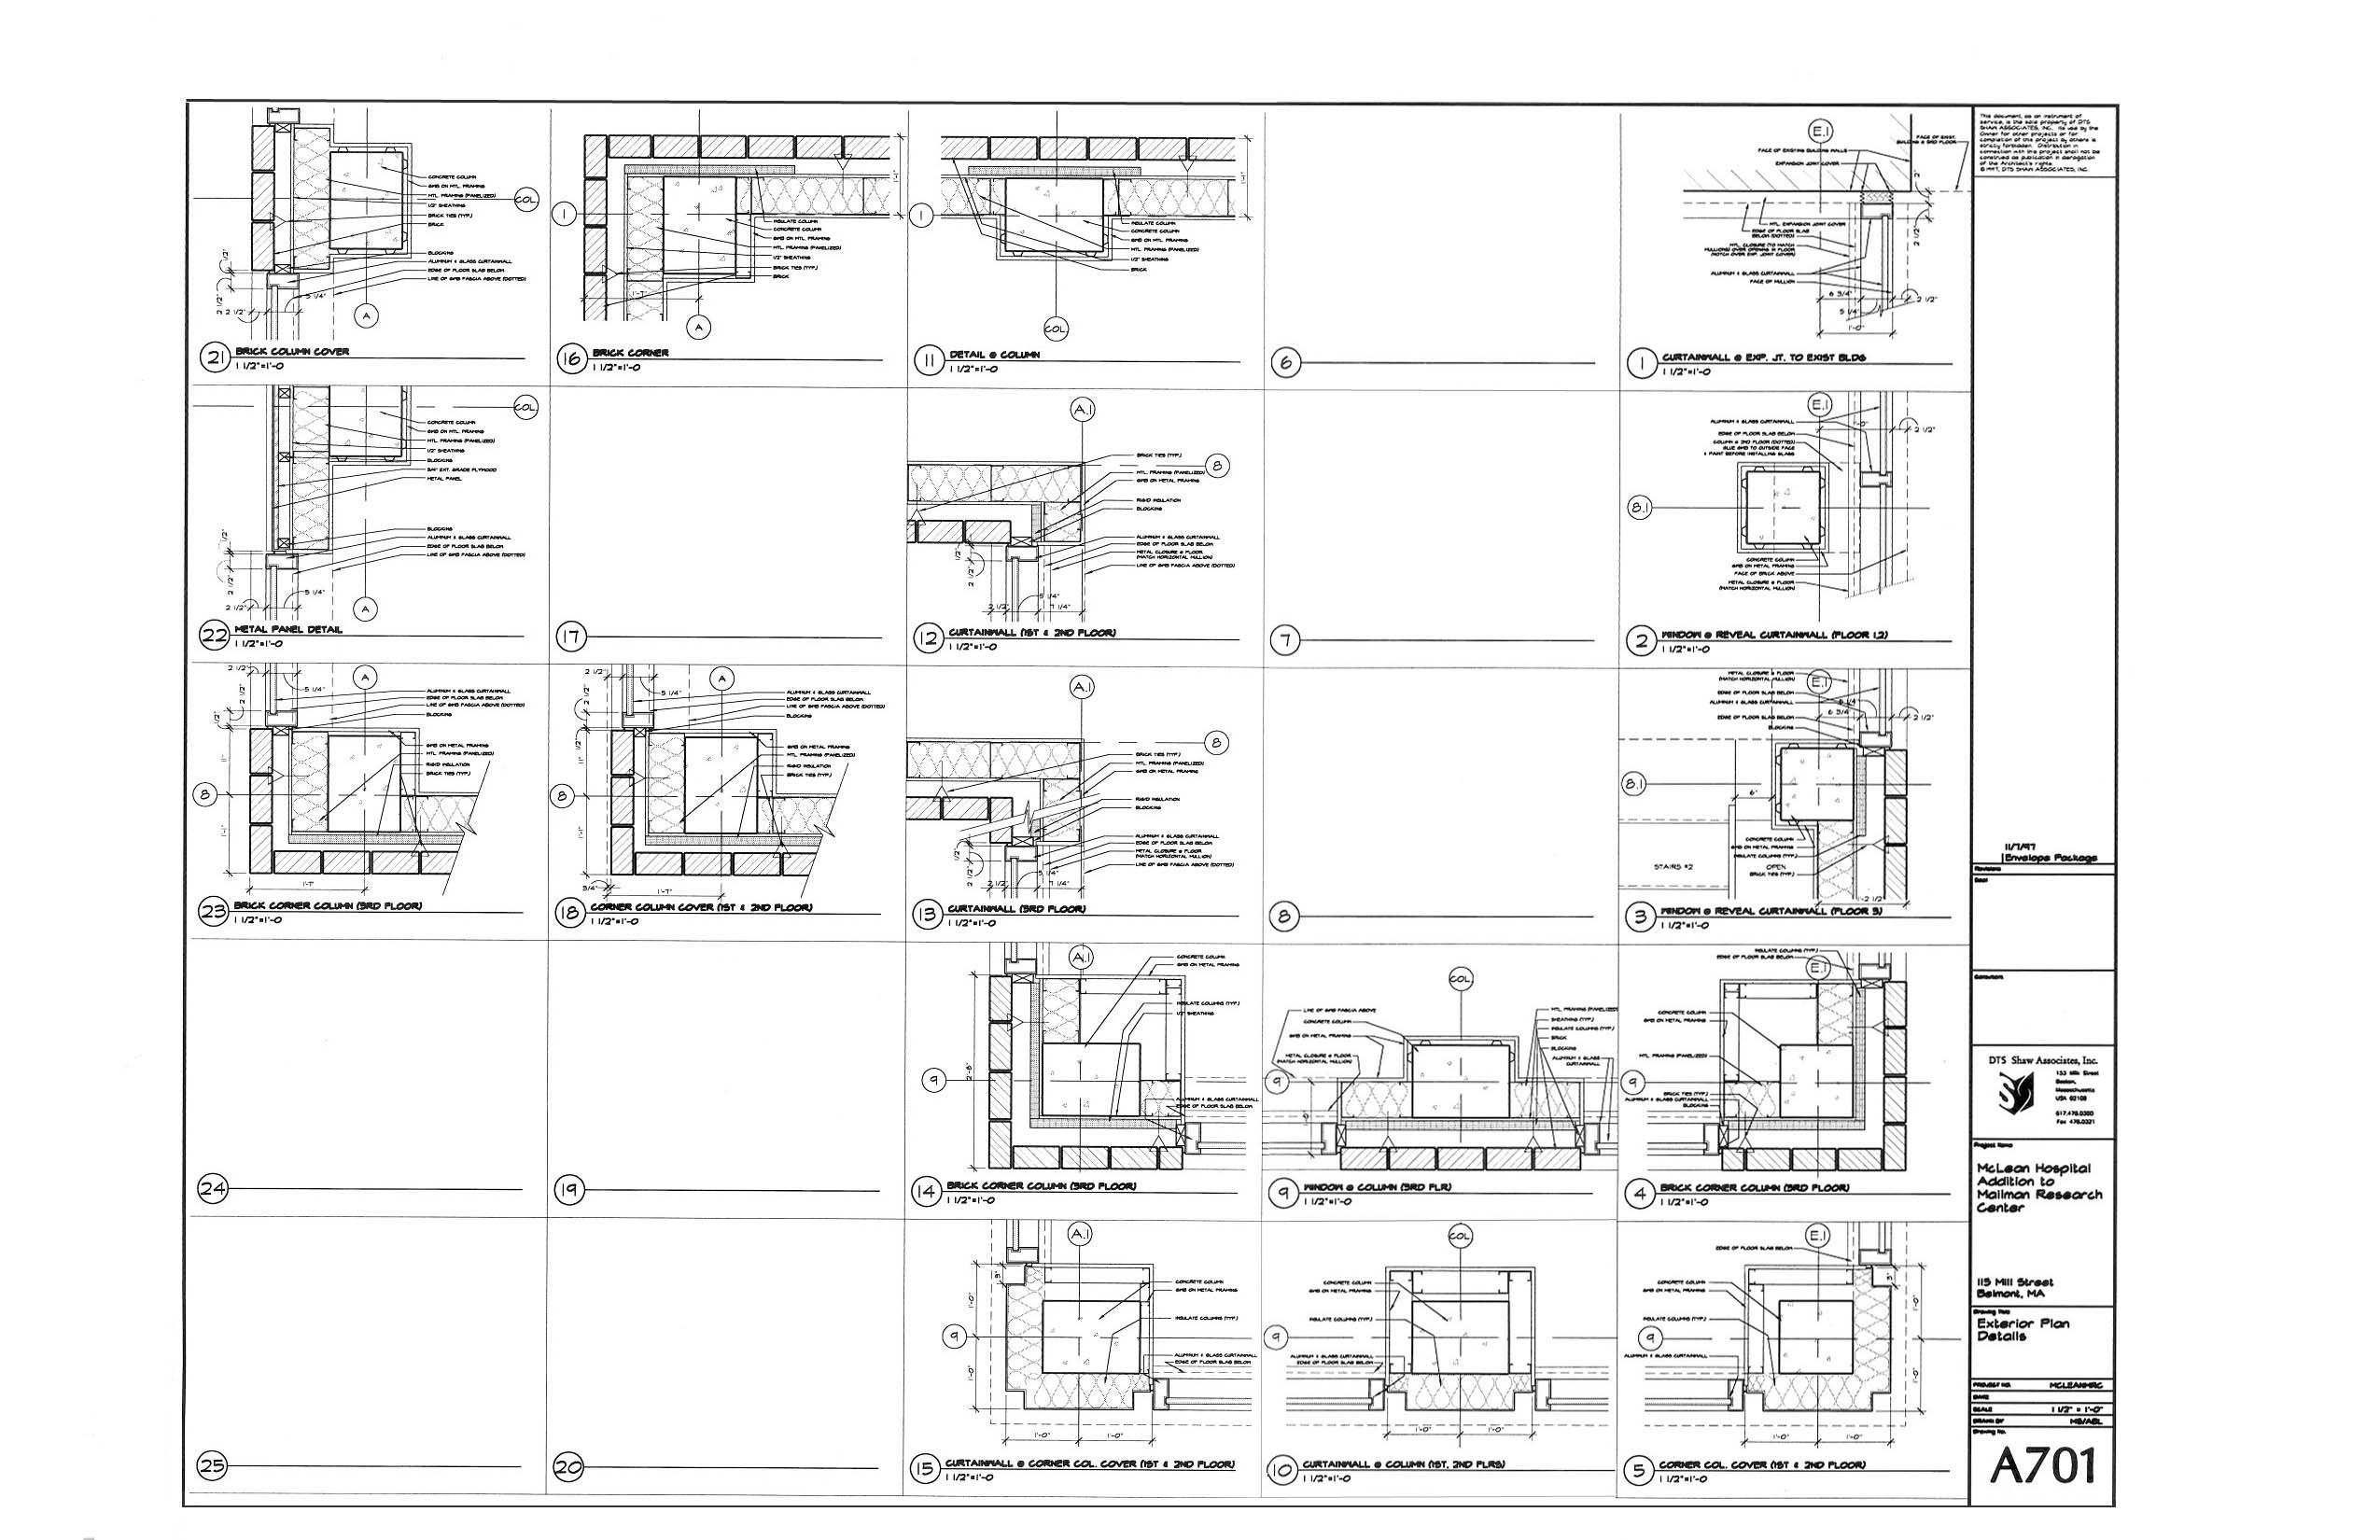 McClean Hospital Wall Details